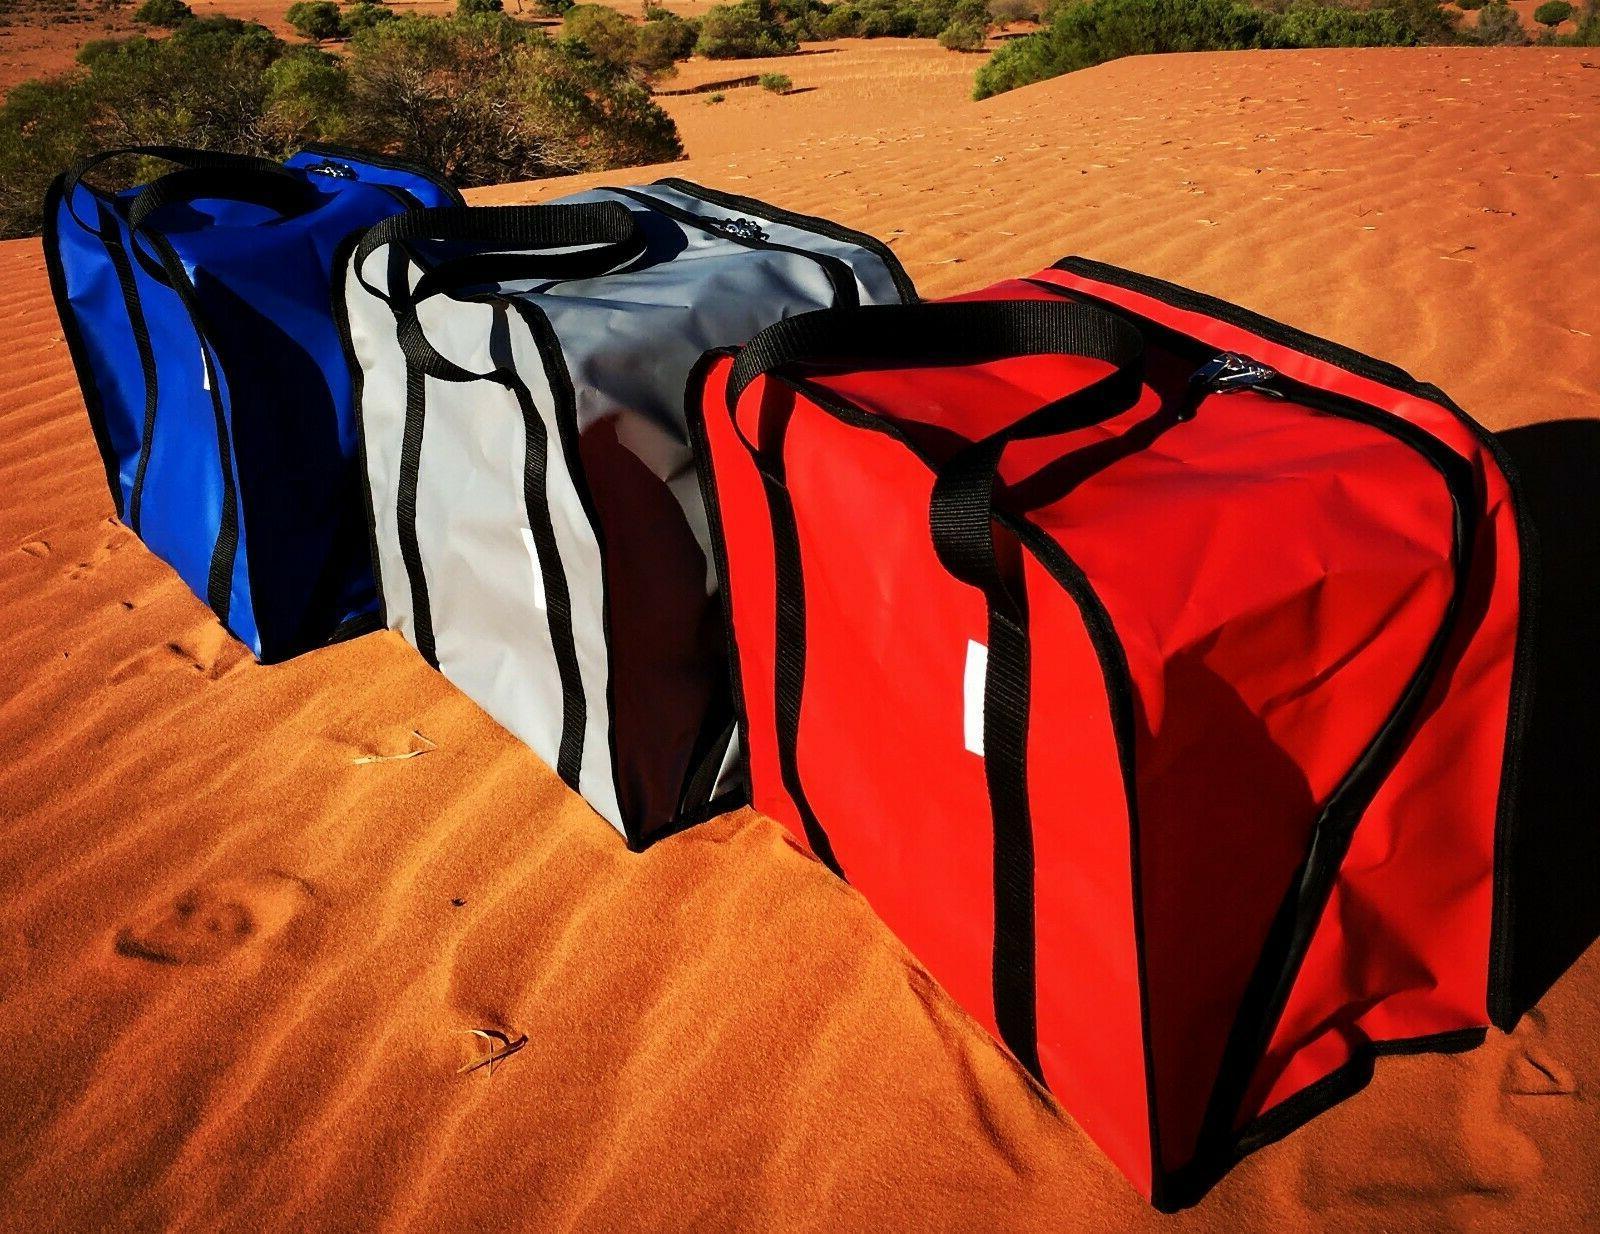 Yamaha EF1000is Bag for camping.